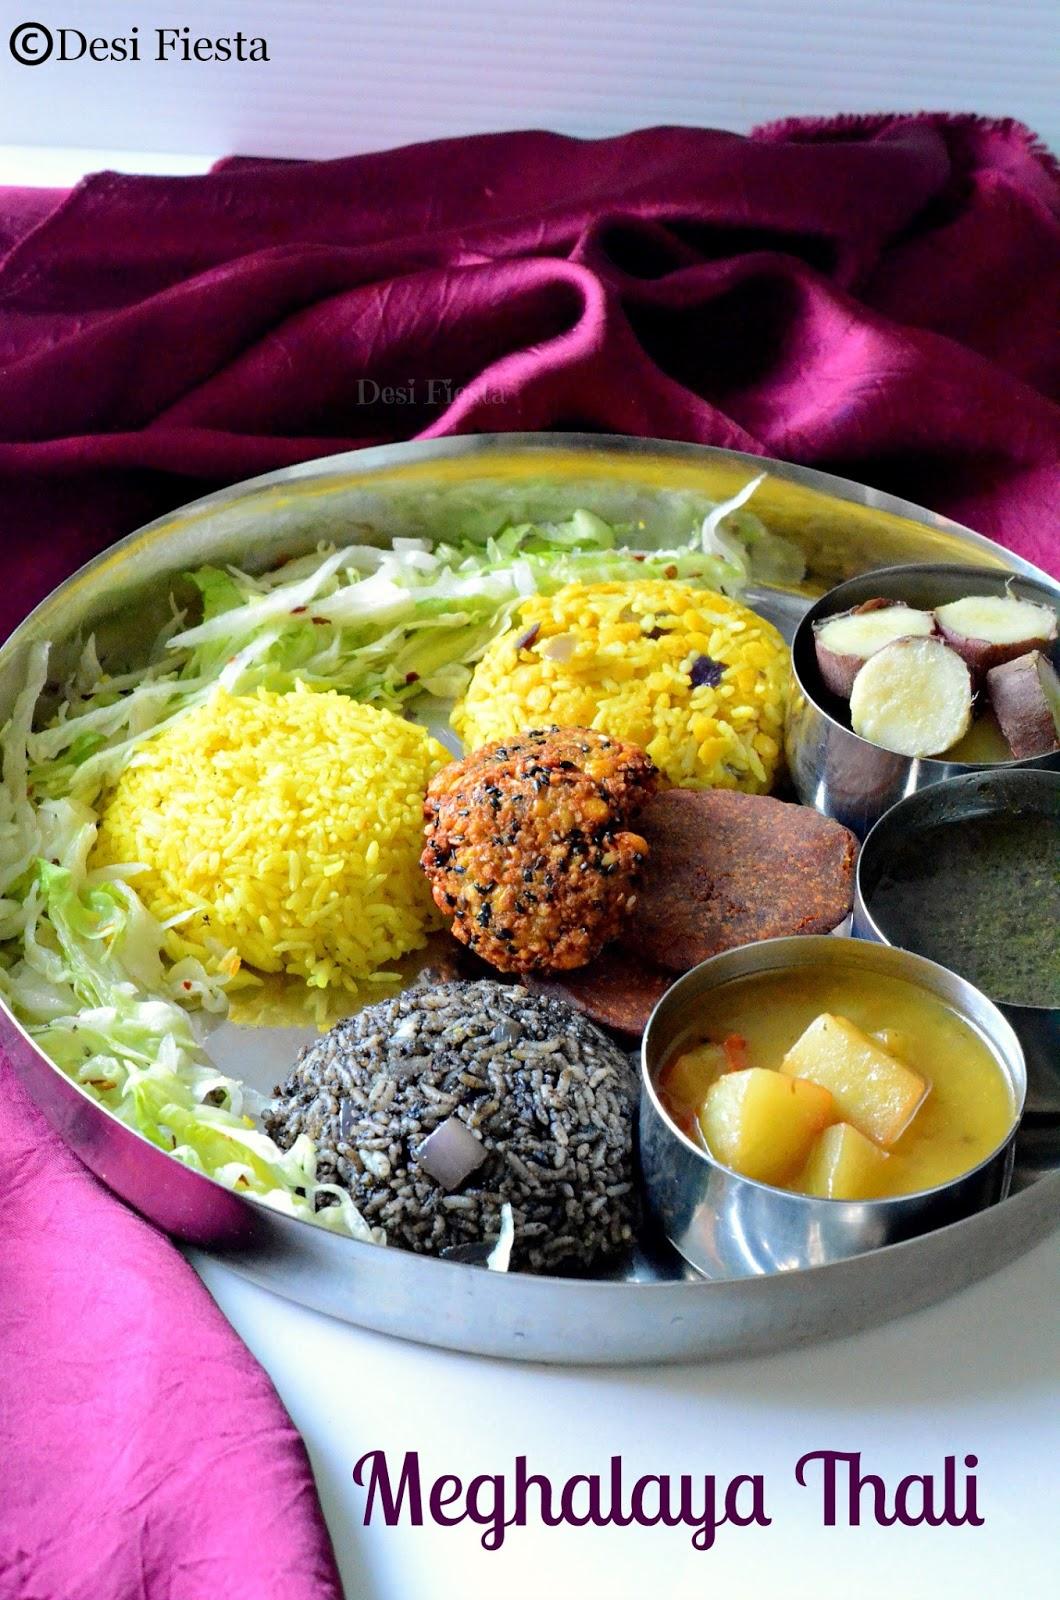 Meghalaya Food Recipes